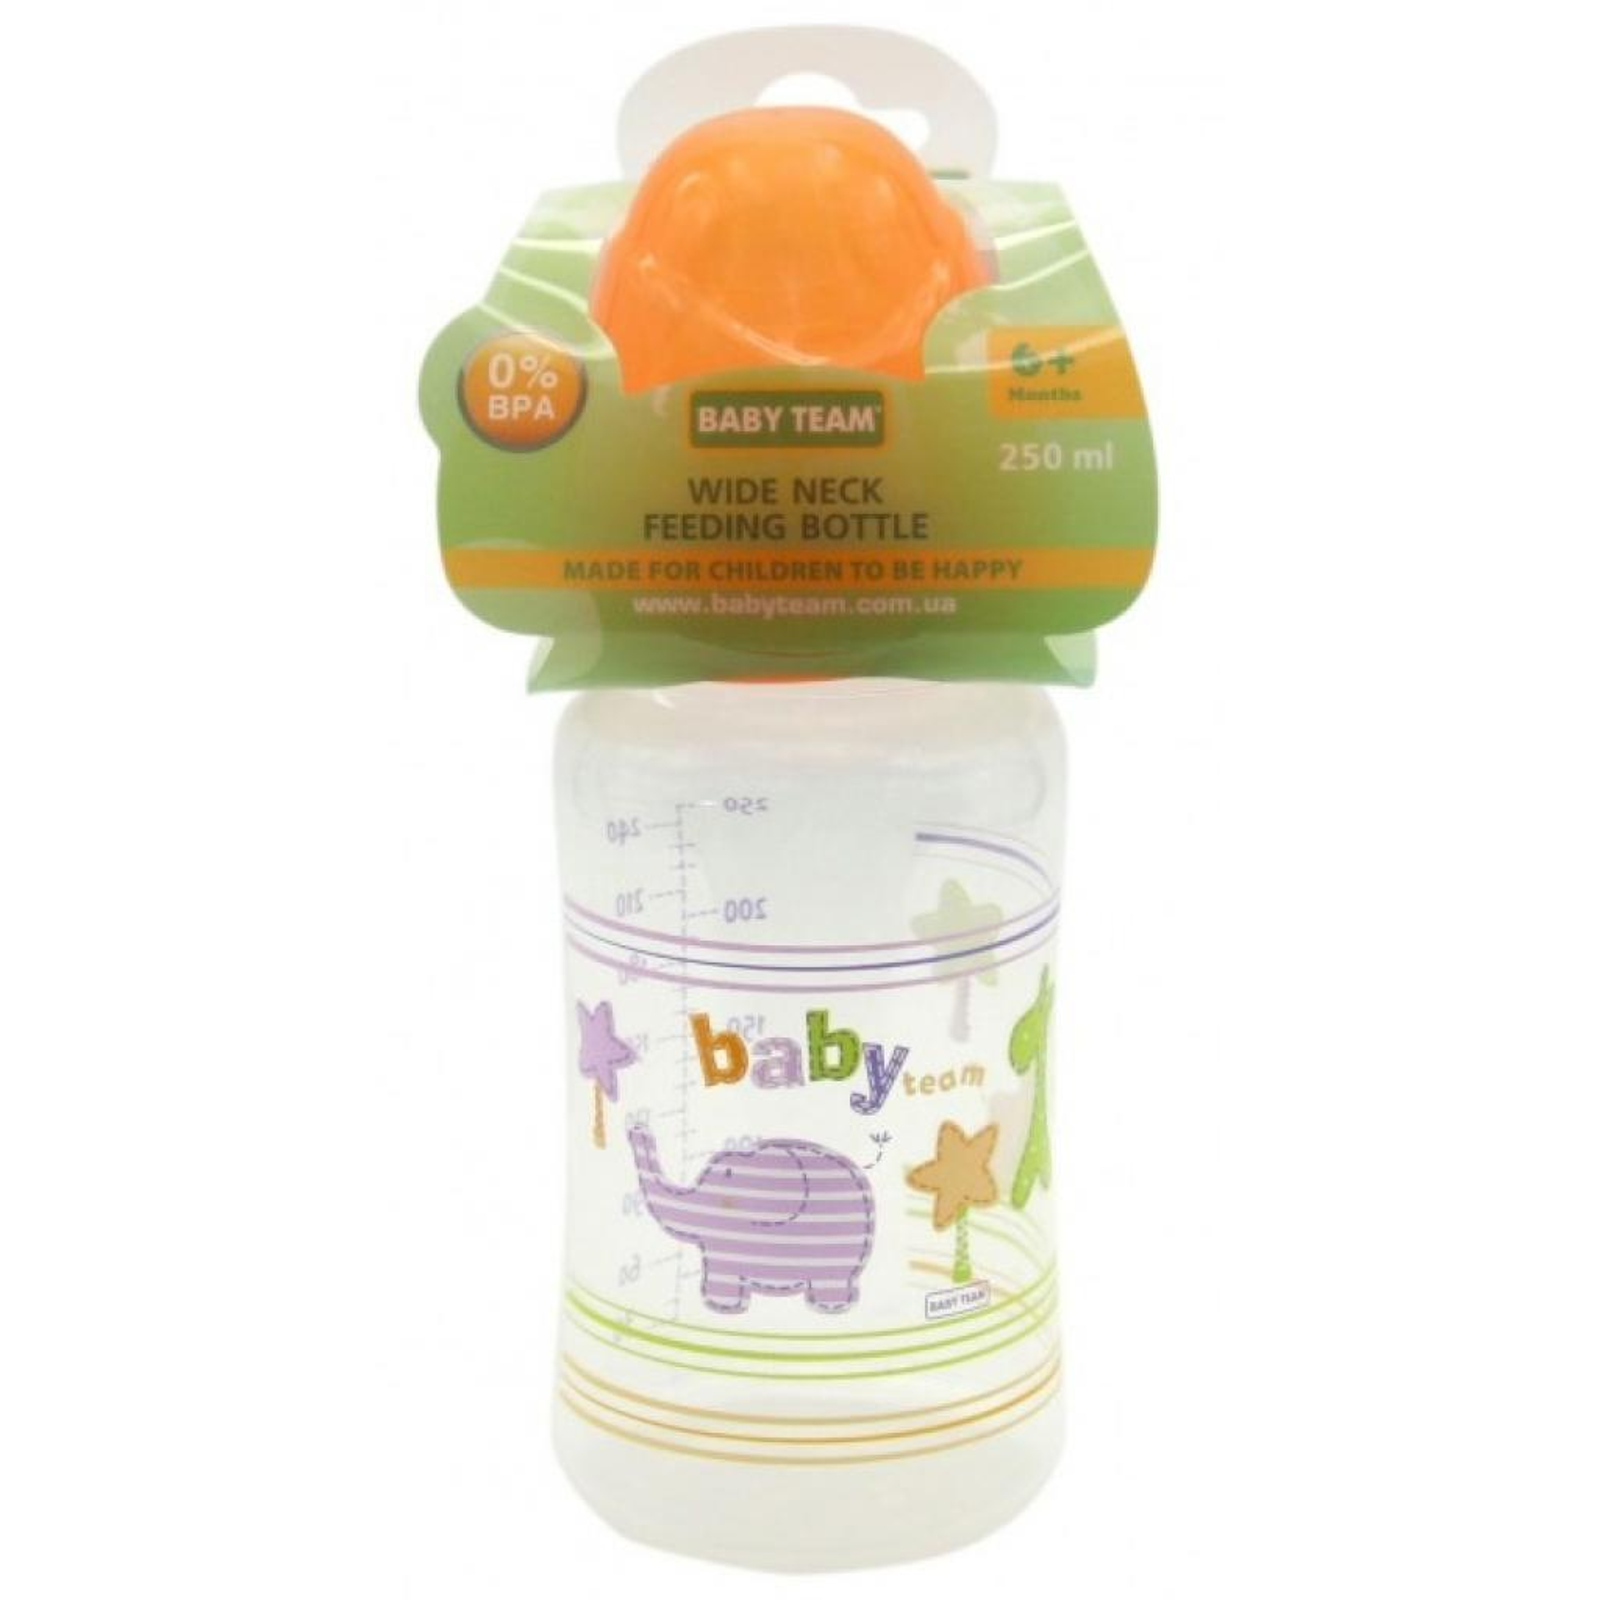 Бутылочка для кормления Baby Team c широким горлом, 250мл 6+ (1002_желтый) изображение 2